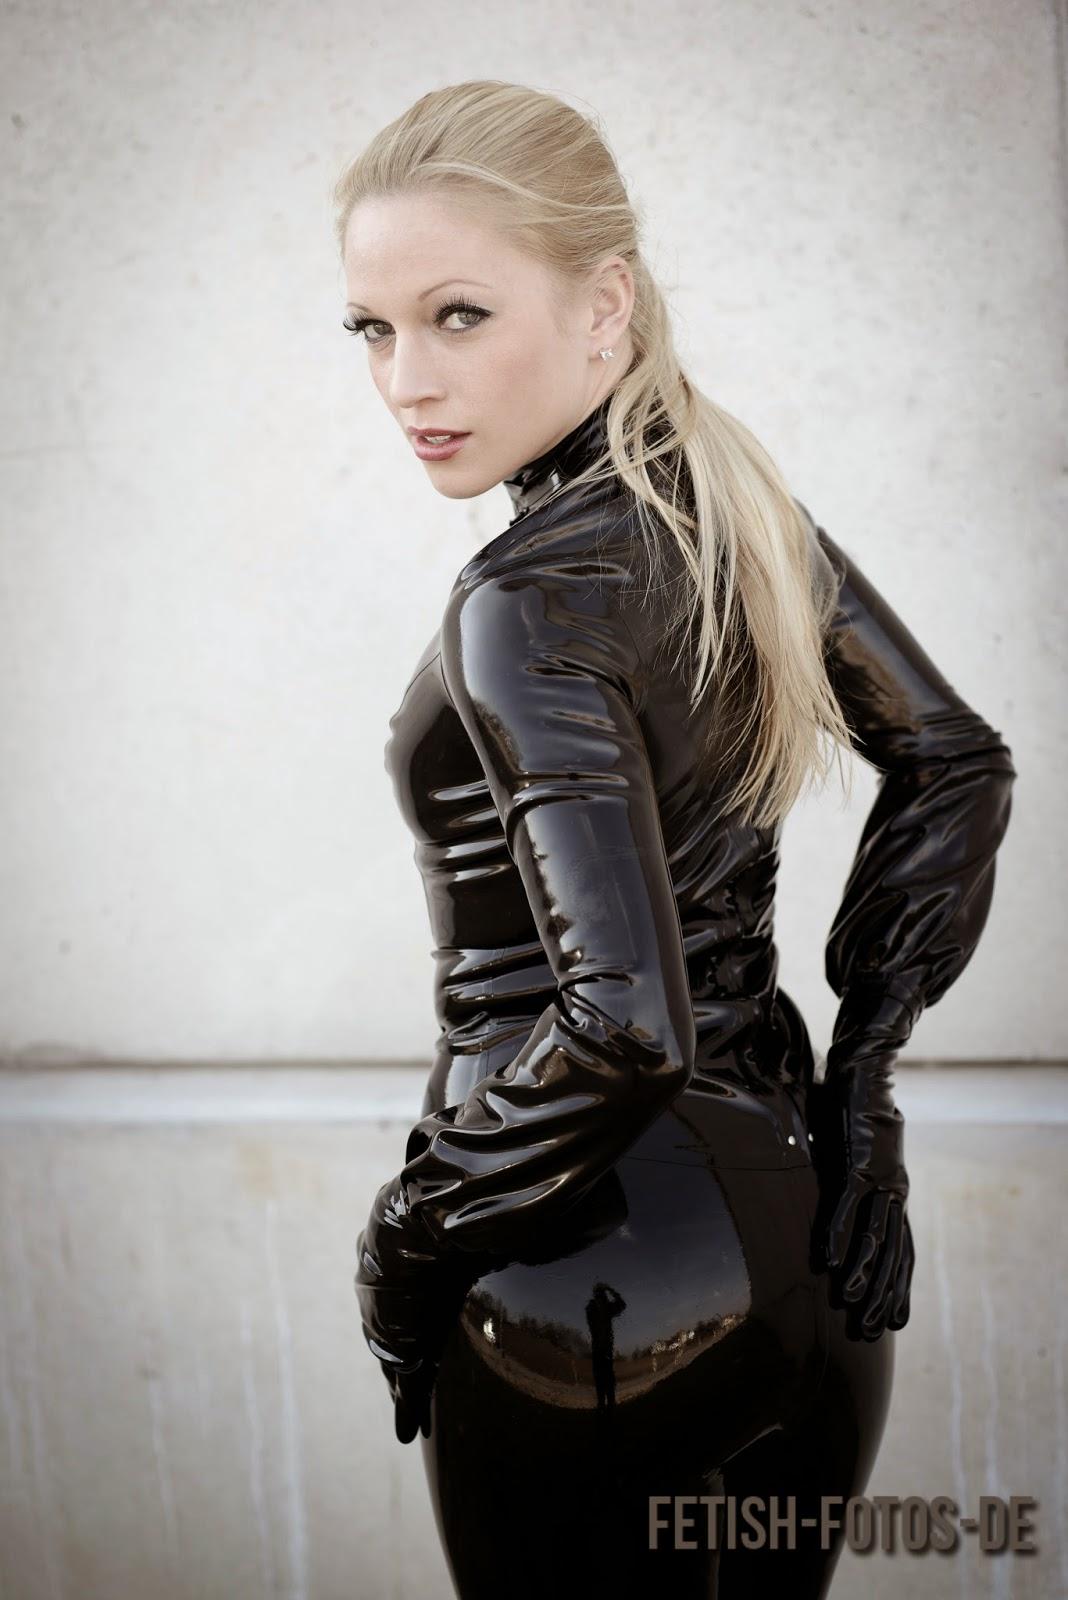 Natalia pearl gangbang